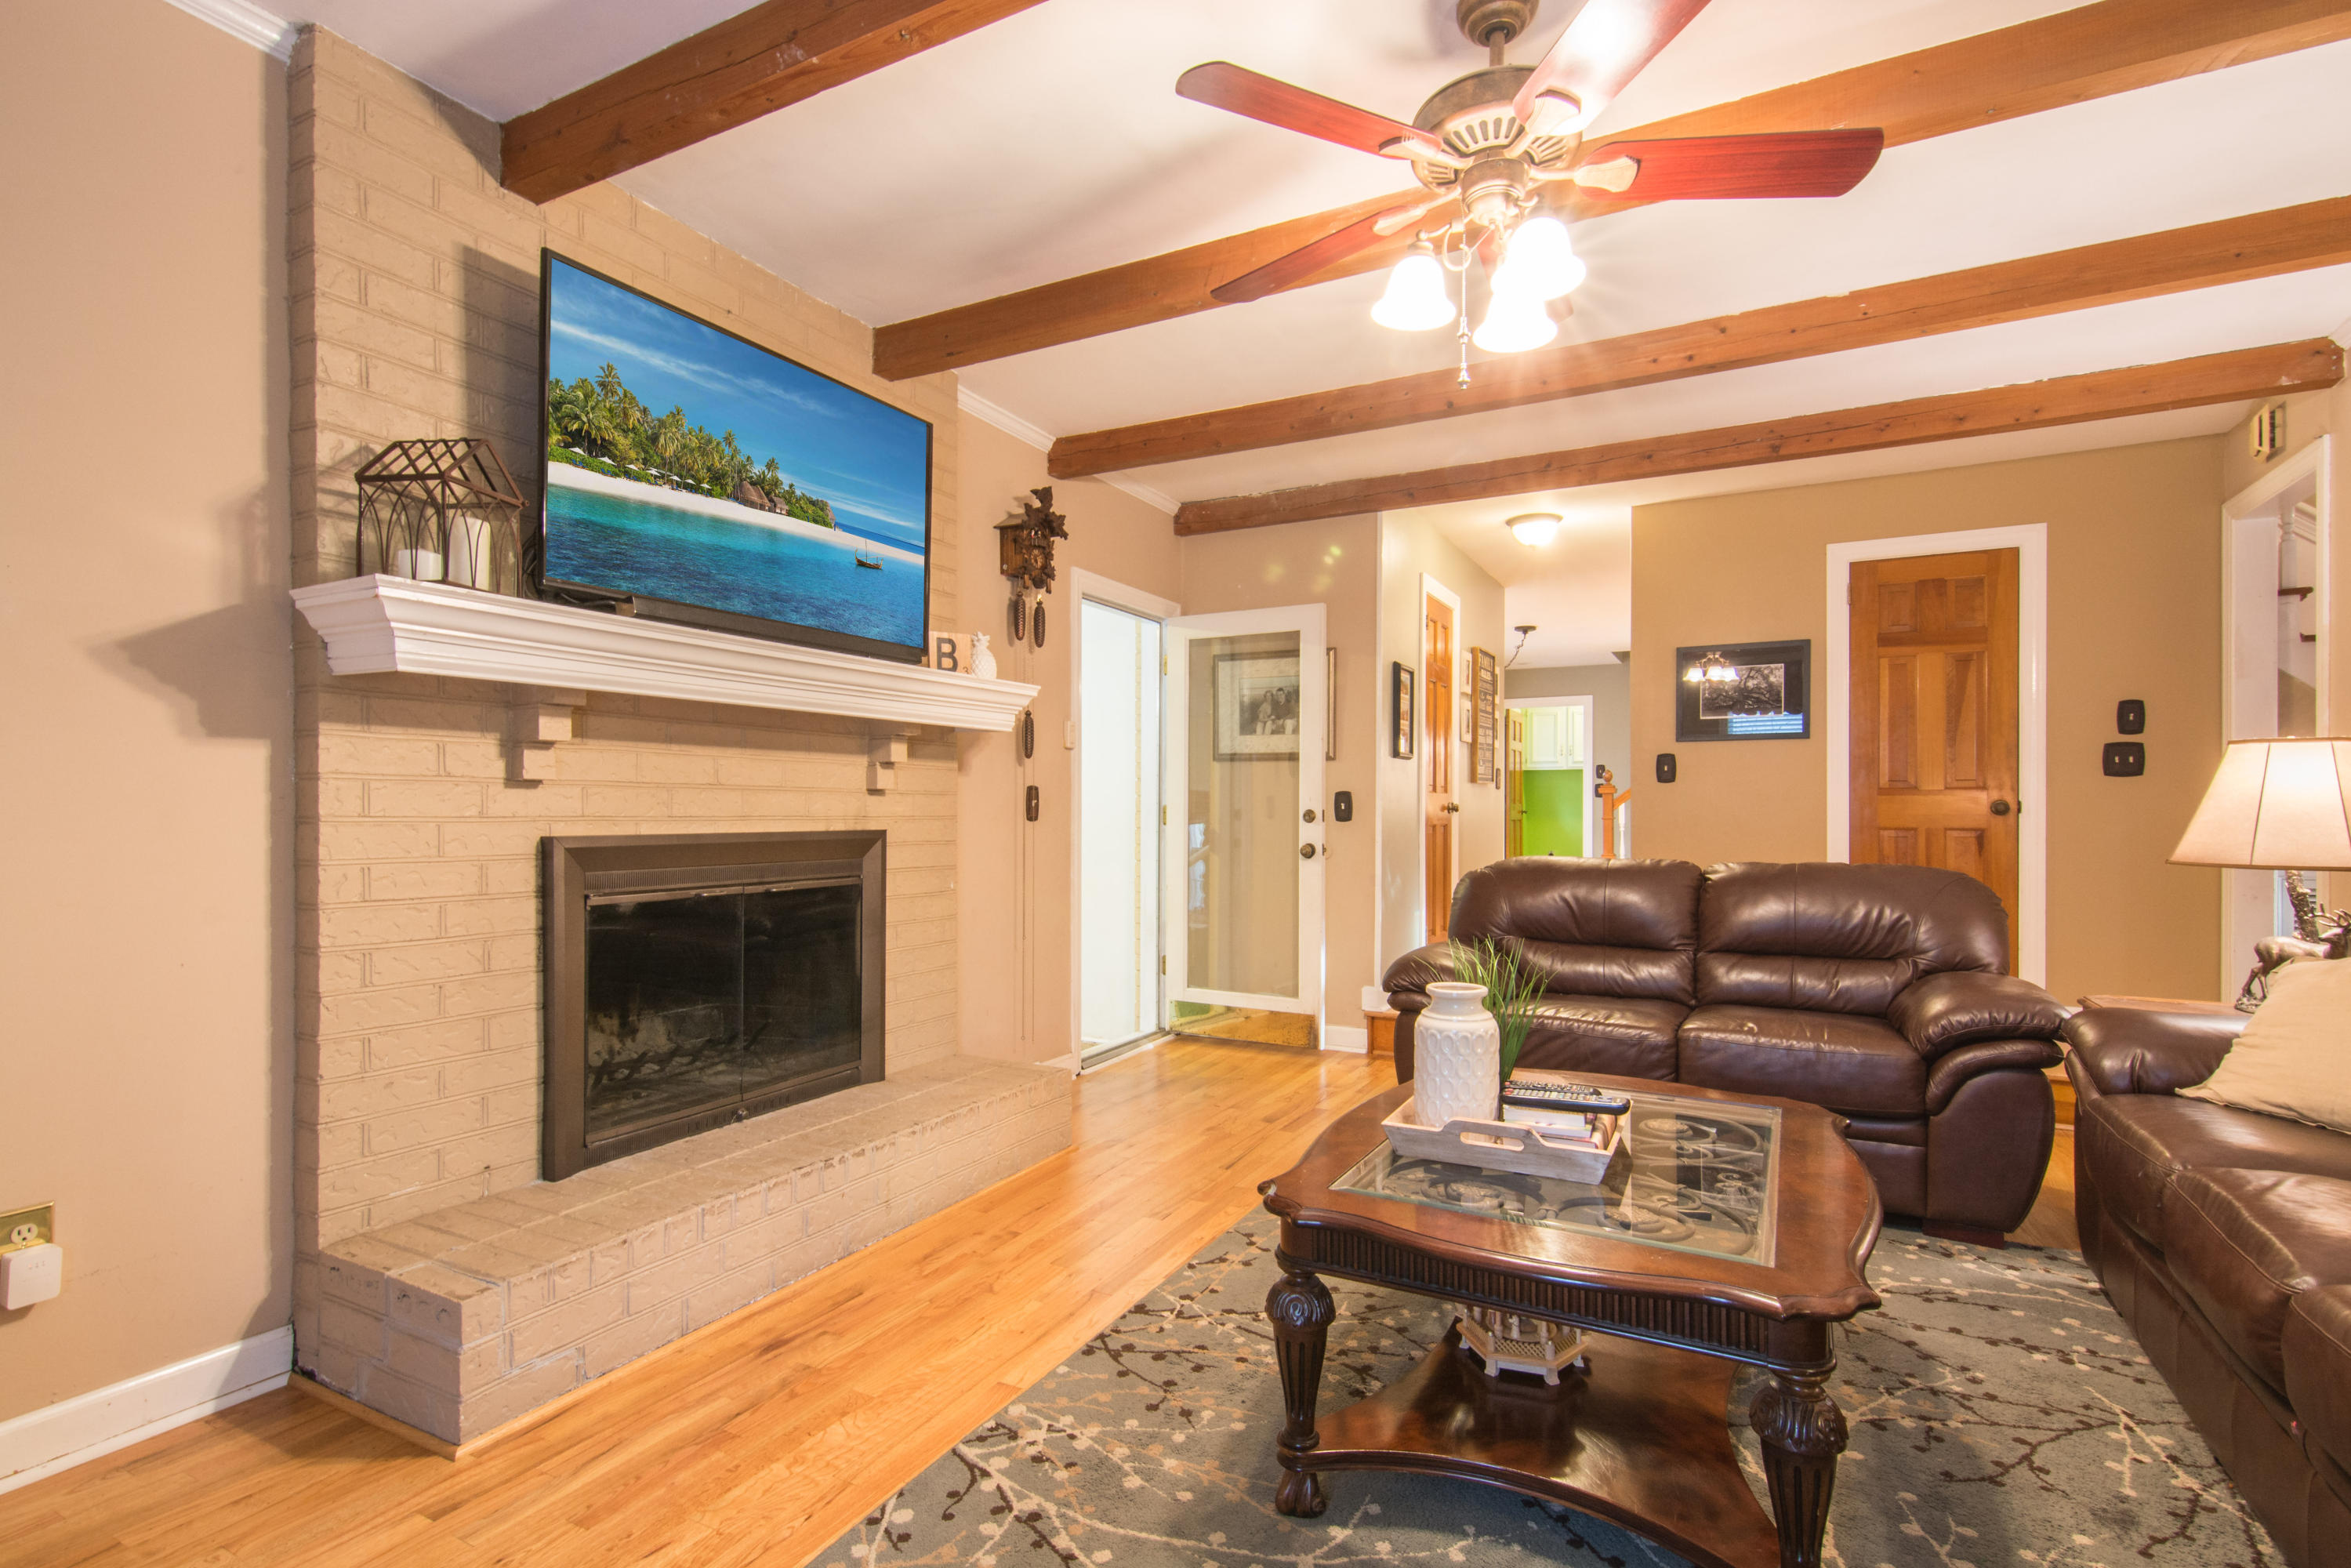 Ashborough East Homes For Sale - 130 Brandywine, Summerville, SC - 15